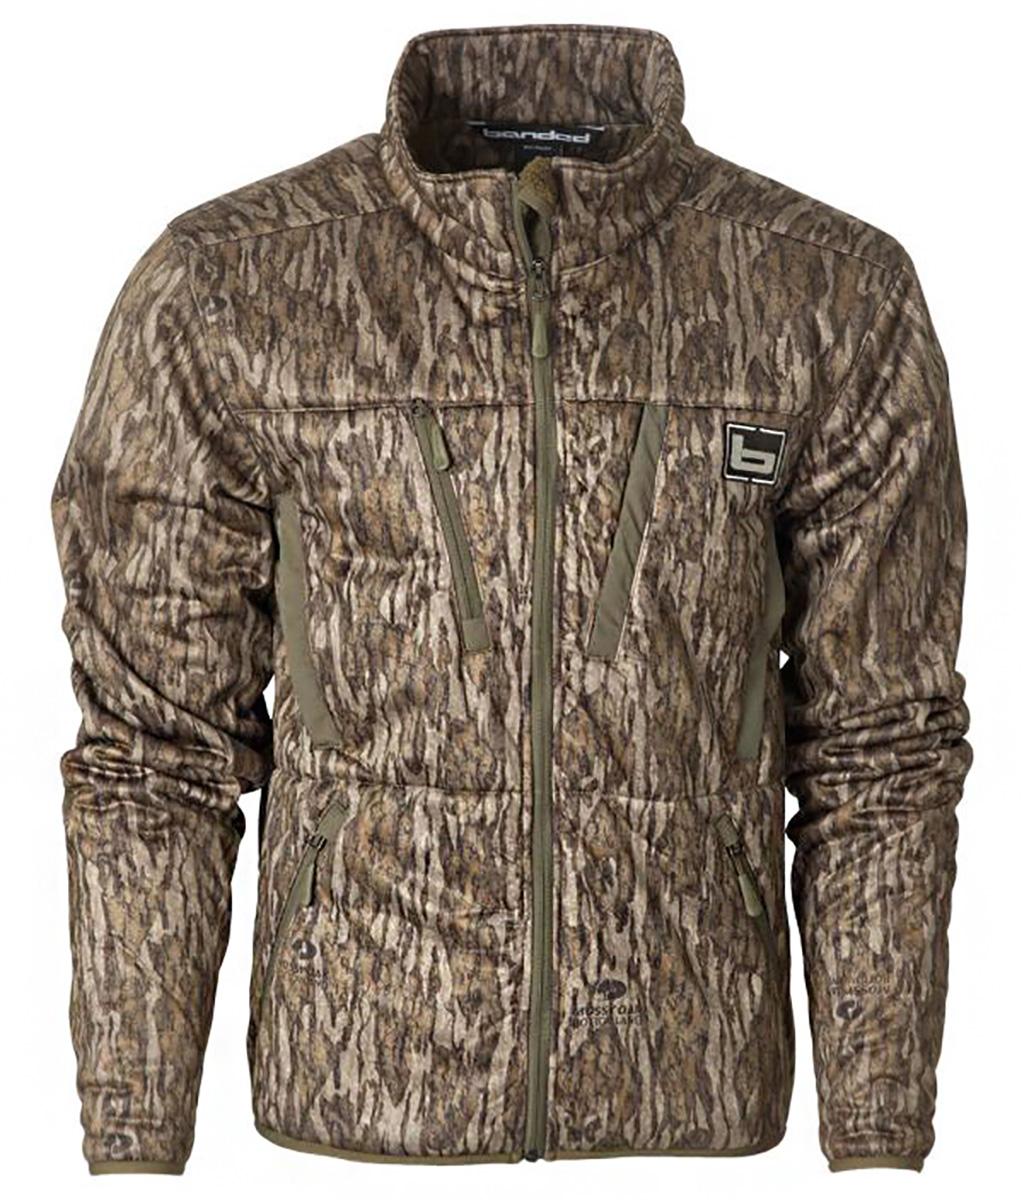 BANDED Men's SWIFT Soft Shell Jacket (B1010033)